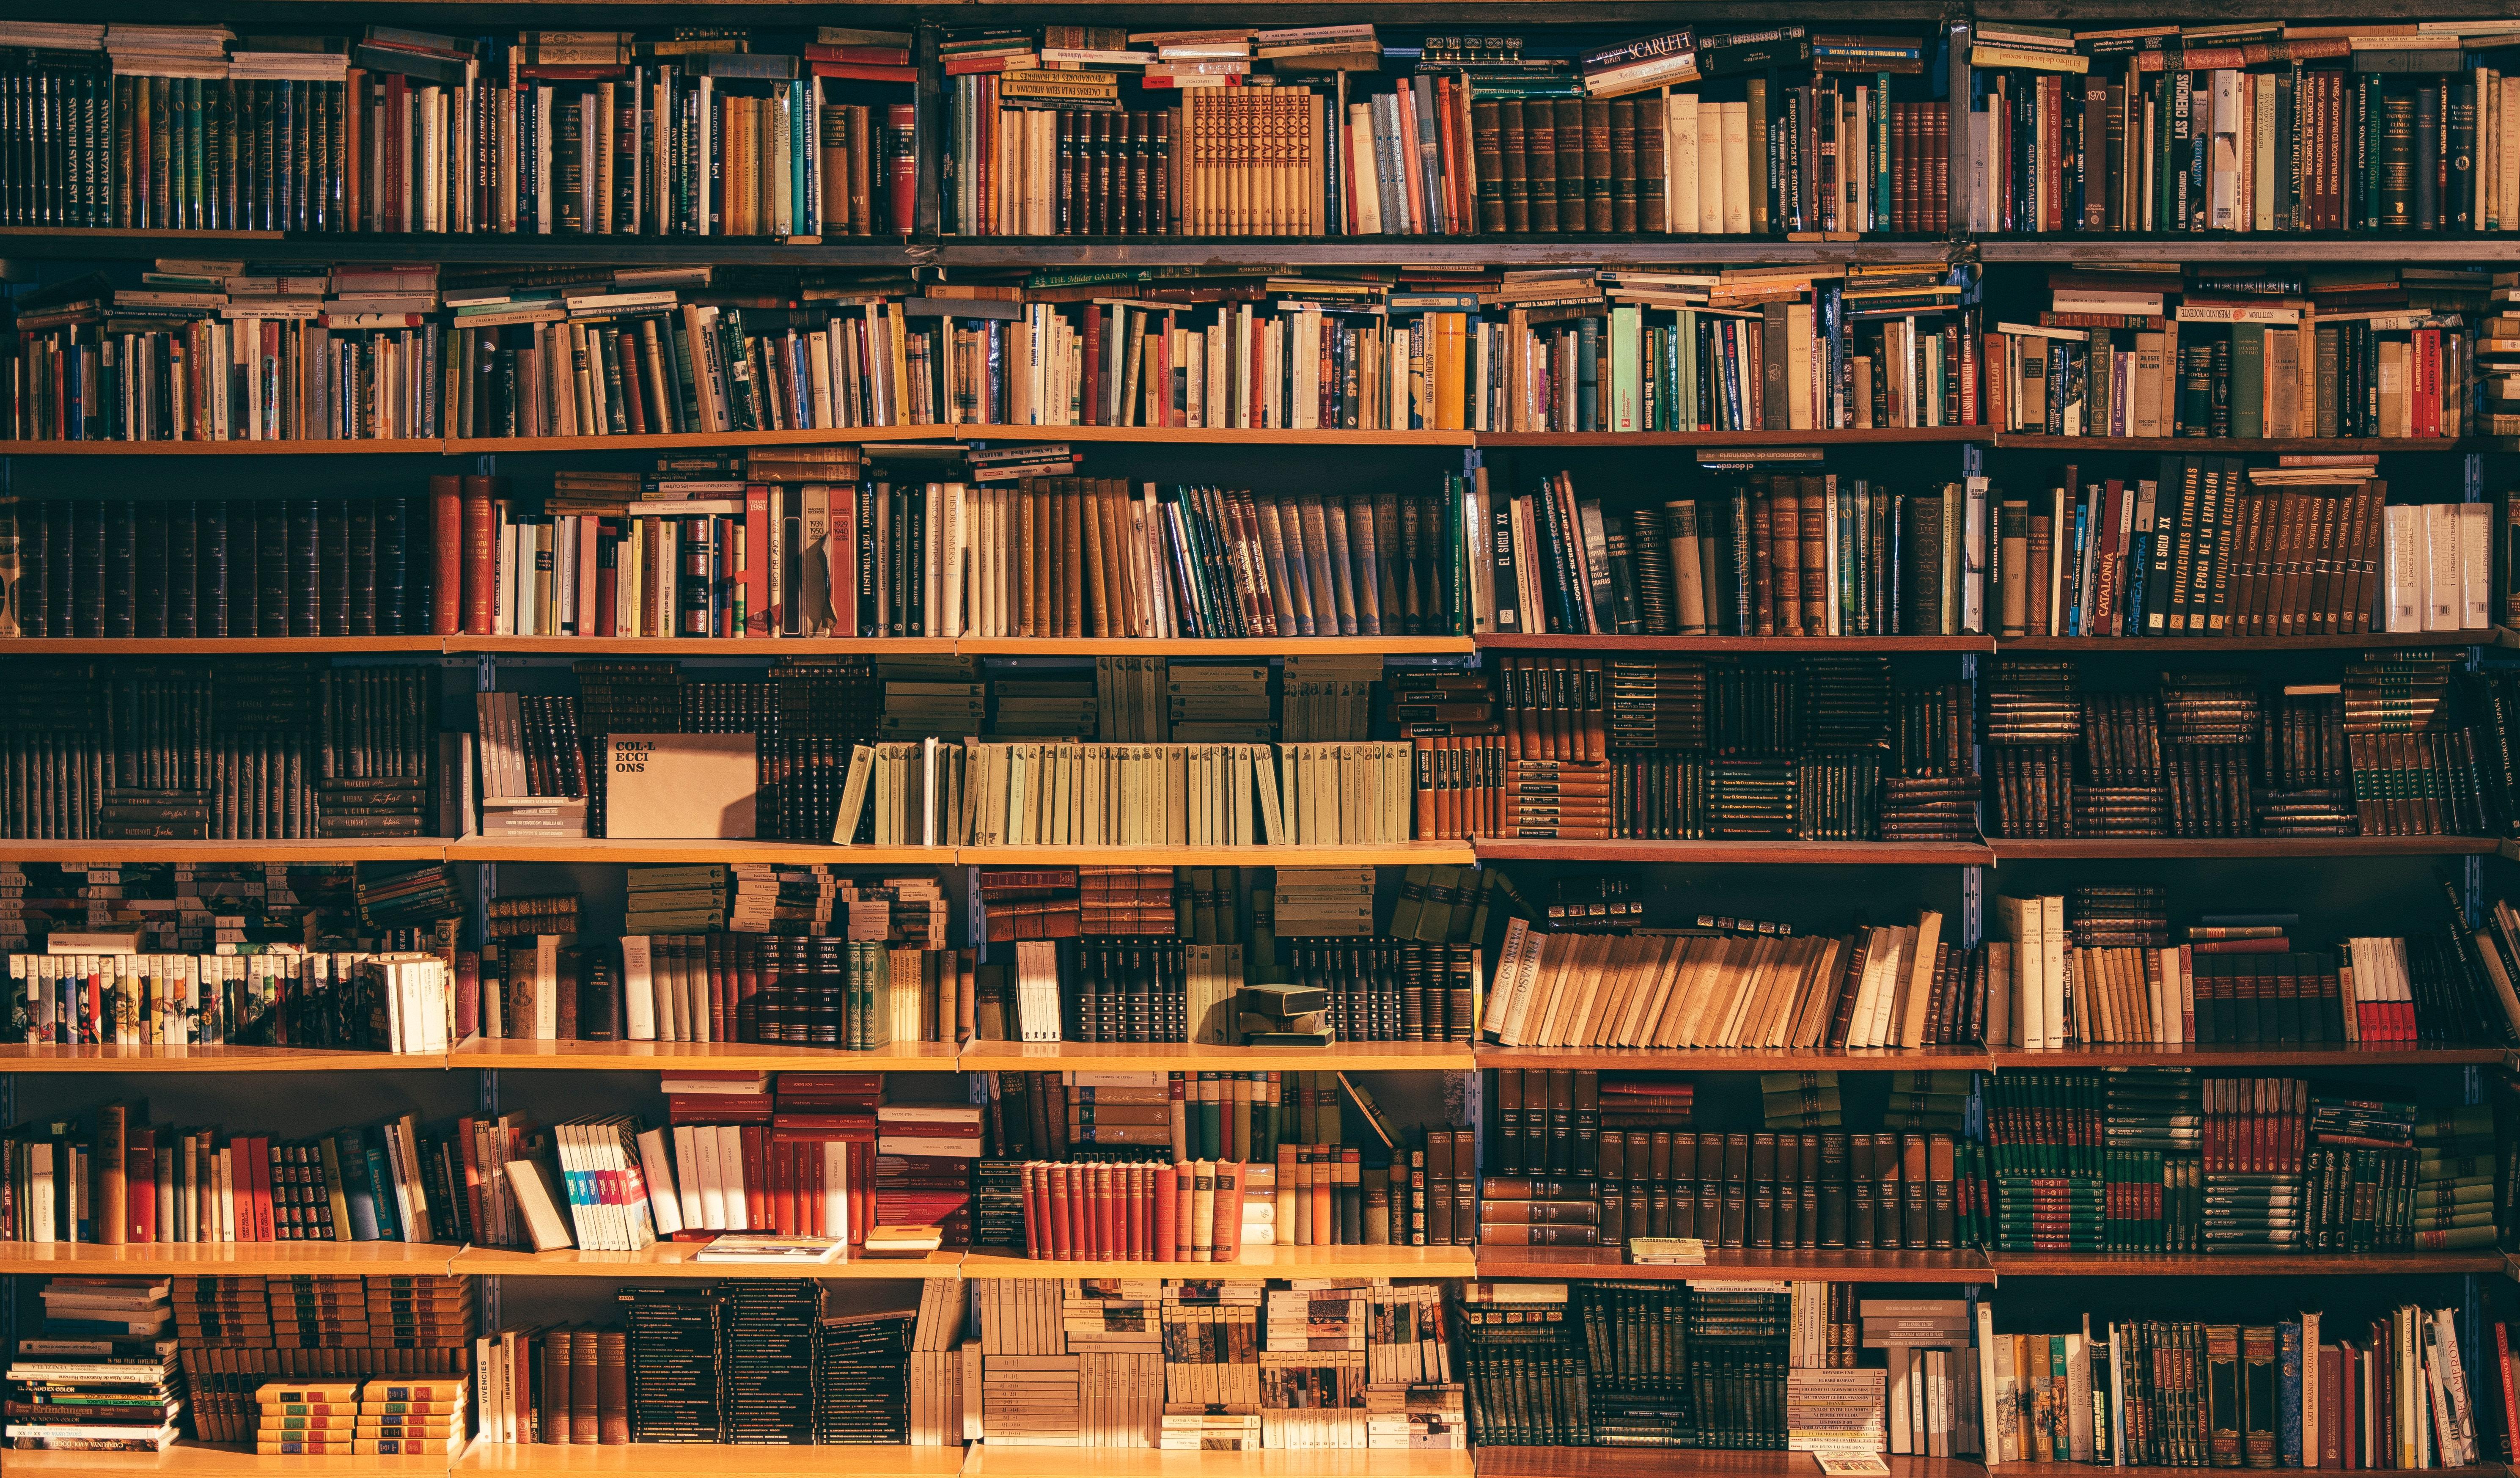 Library shelve